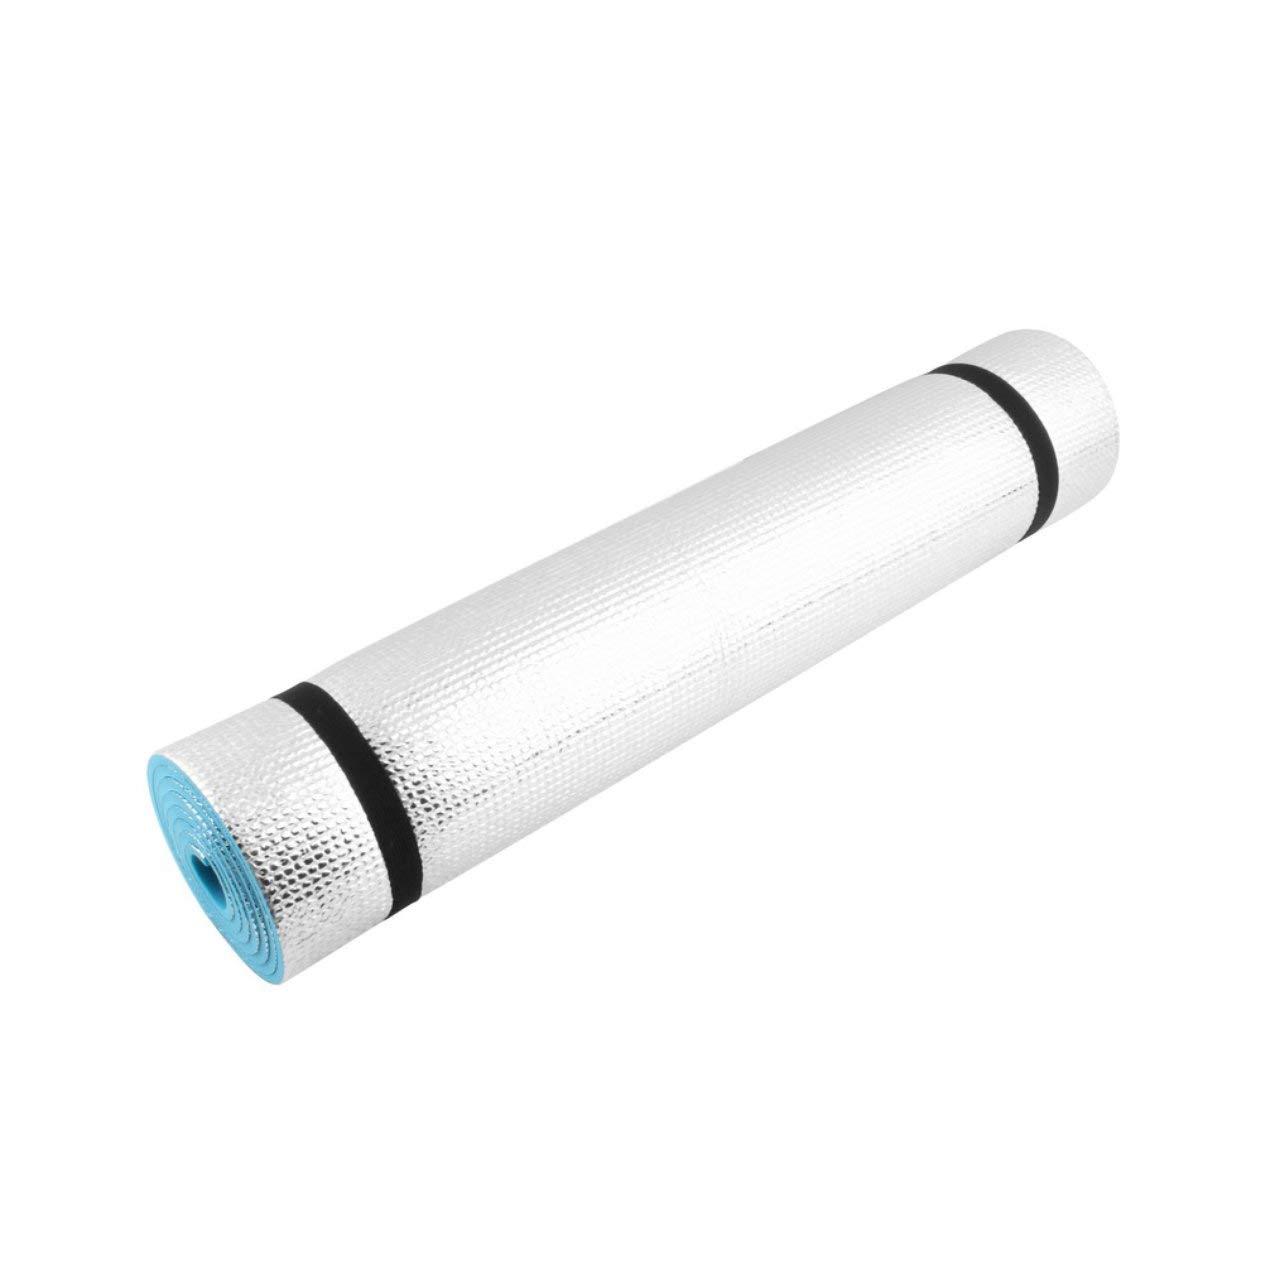 ROTstrong Isomatte, Leichte 180X60X0,6 cm Matte Waschbar Übung Fitness Pad Faltboden Spiel Kissen Universal Isomatte